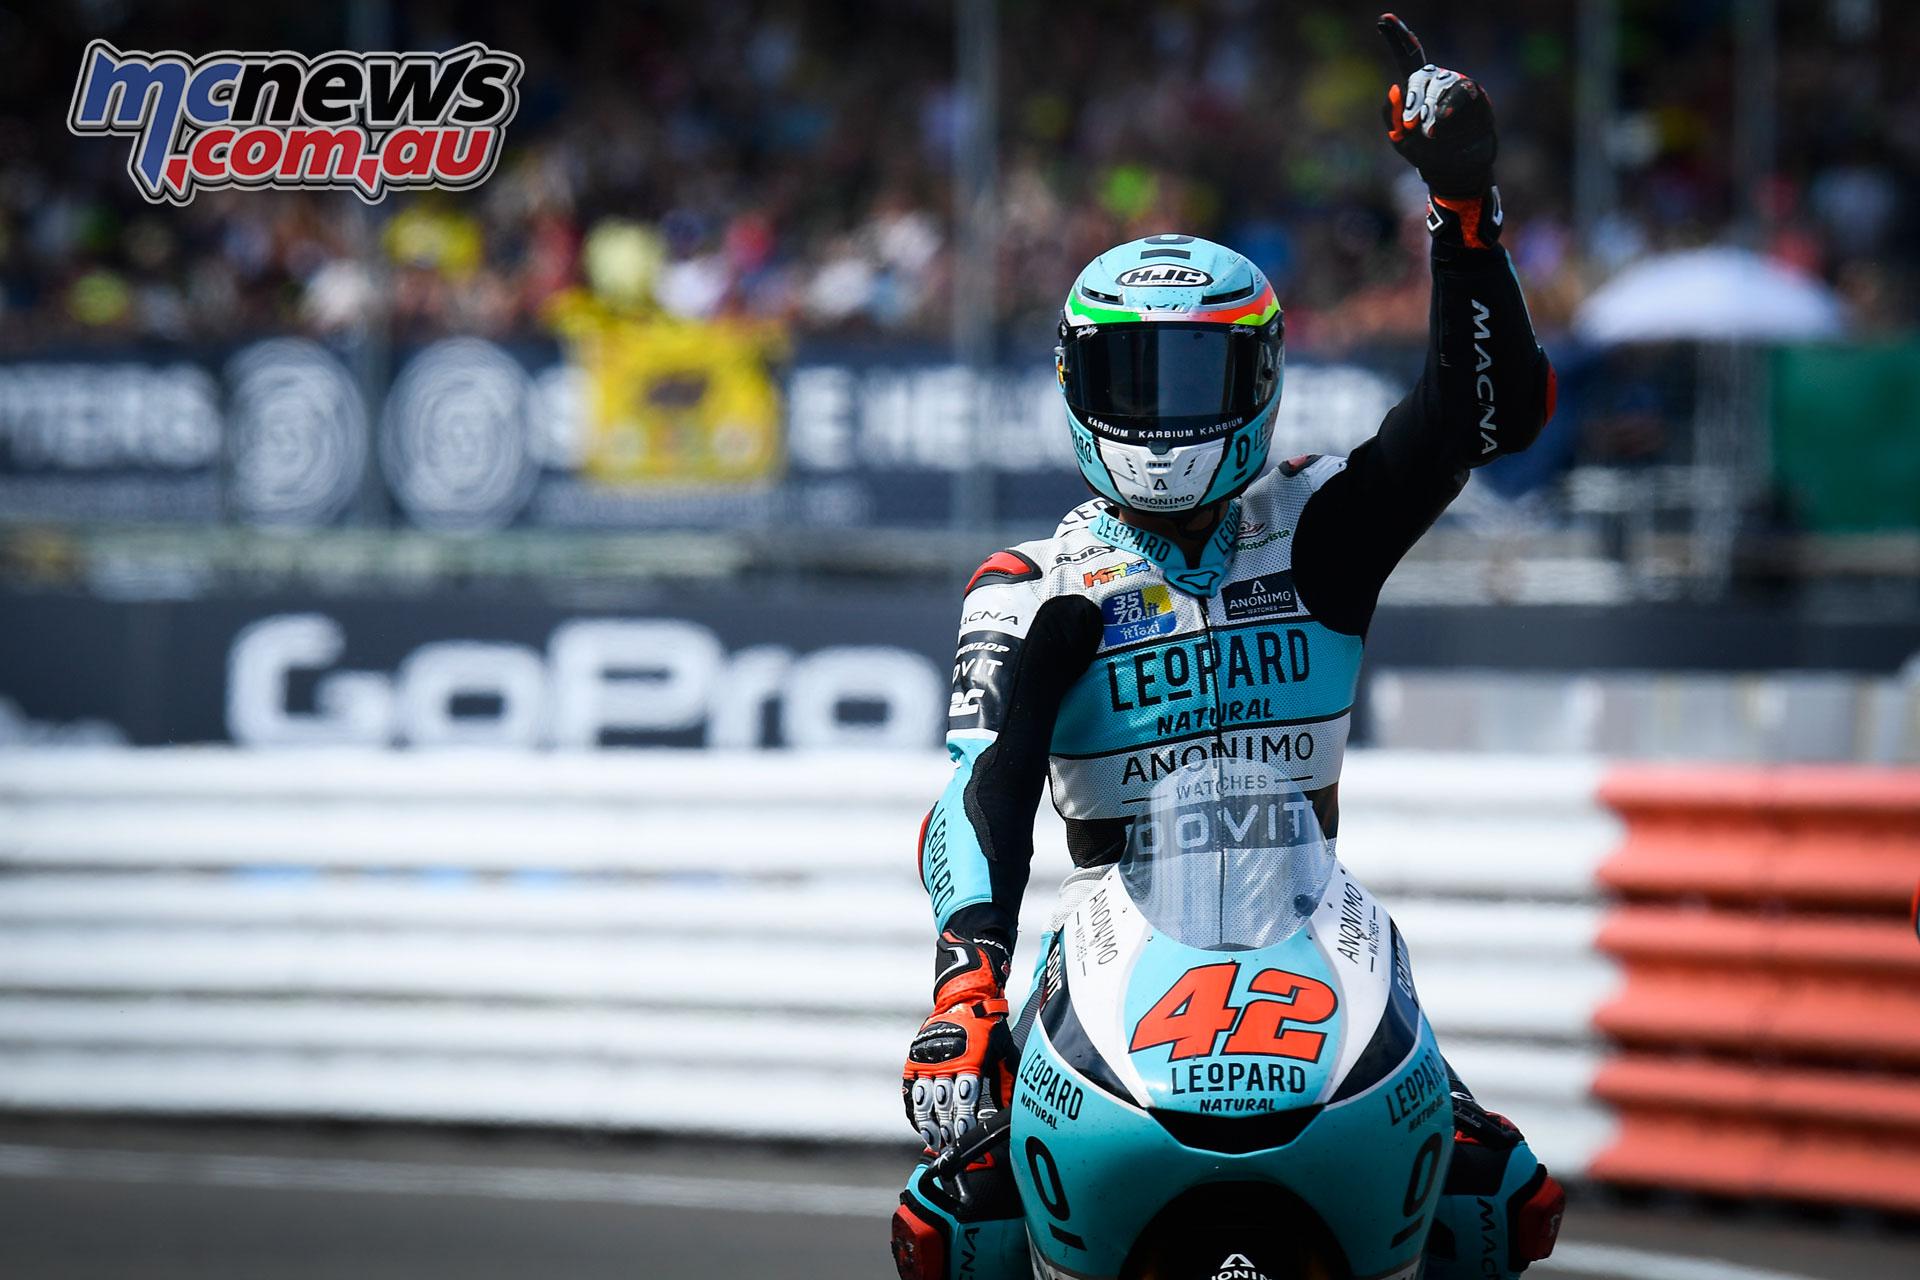 MotoGP Rnd Silverstone Moto Marcos Ramirez